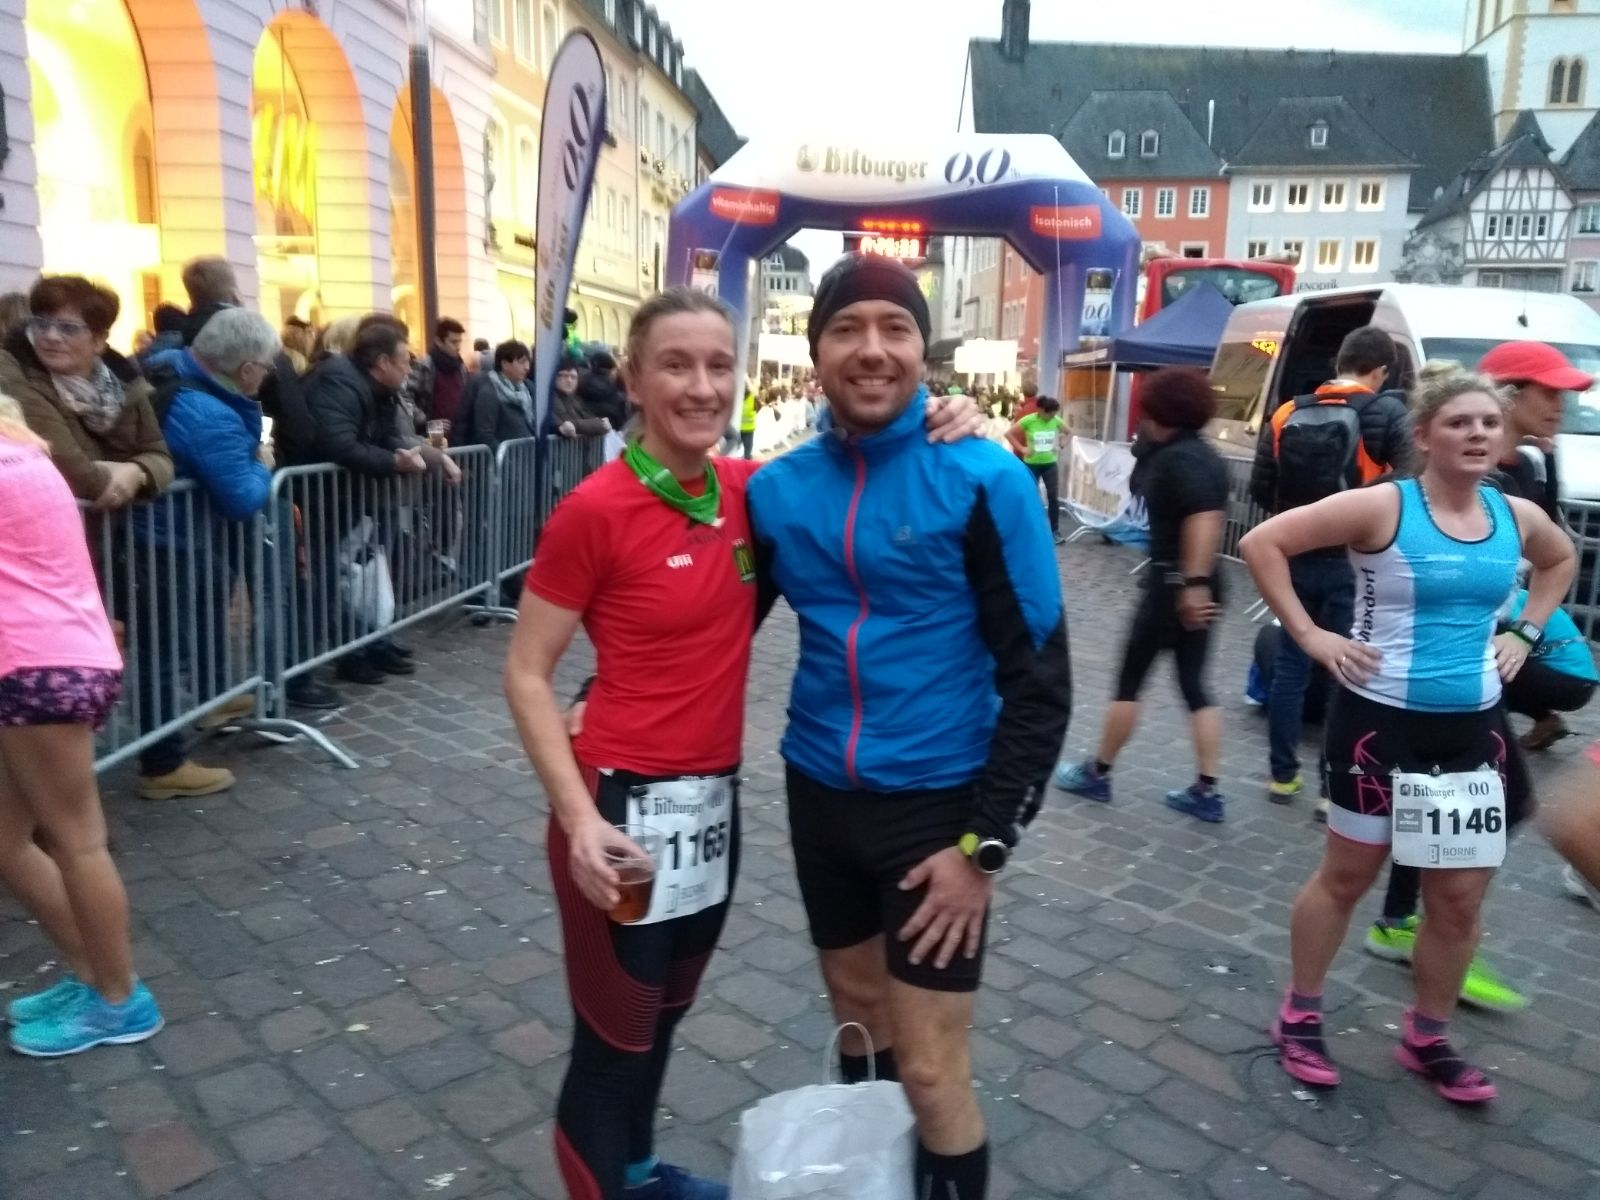 Unsere Athleten in Trier: Ulli & Christoph